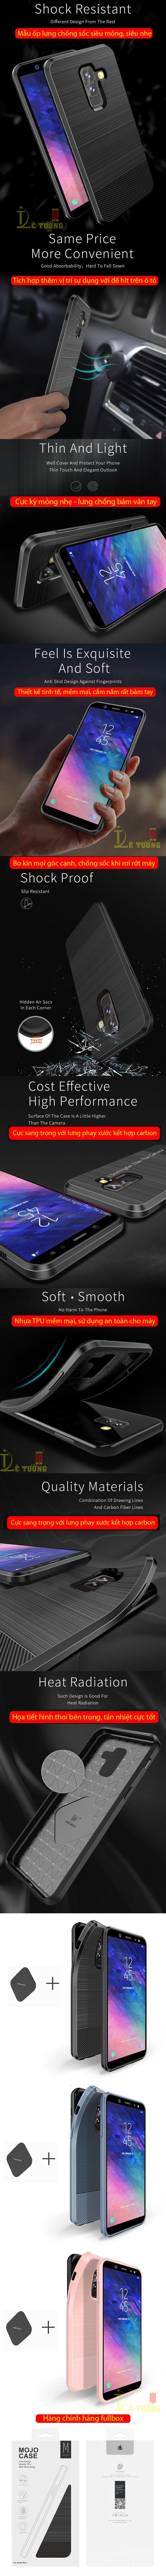 Ốp lưng Galaxy A6 Plus 2018 Dux Ducis Mojo Carbon Fiber nhựa mềm 7